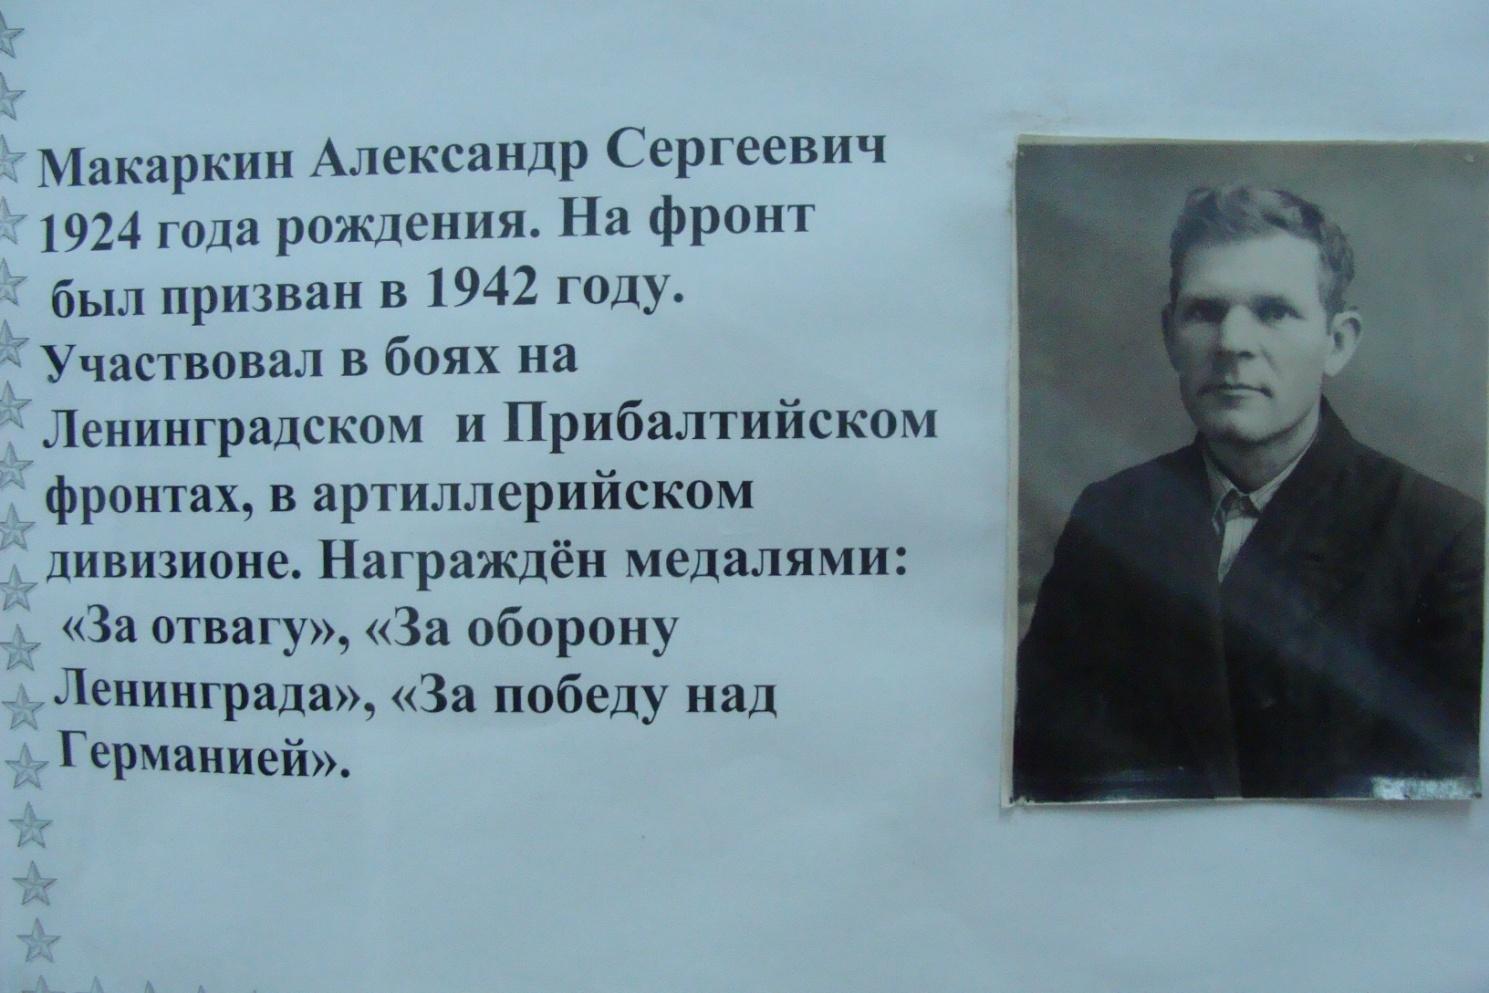 G:\Ветераны -ленинградцы\DSC08158.JPG